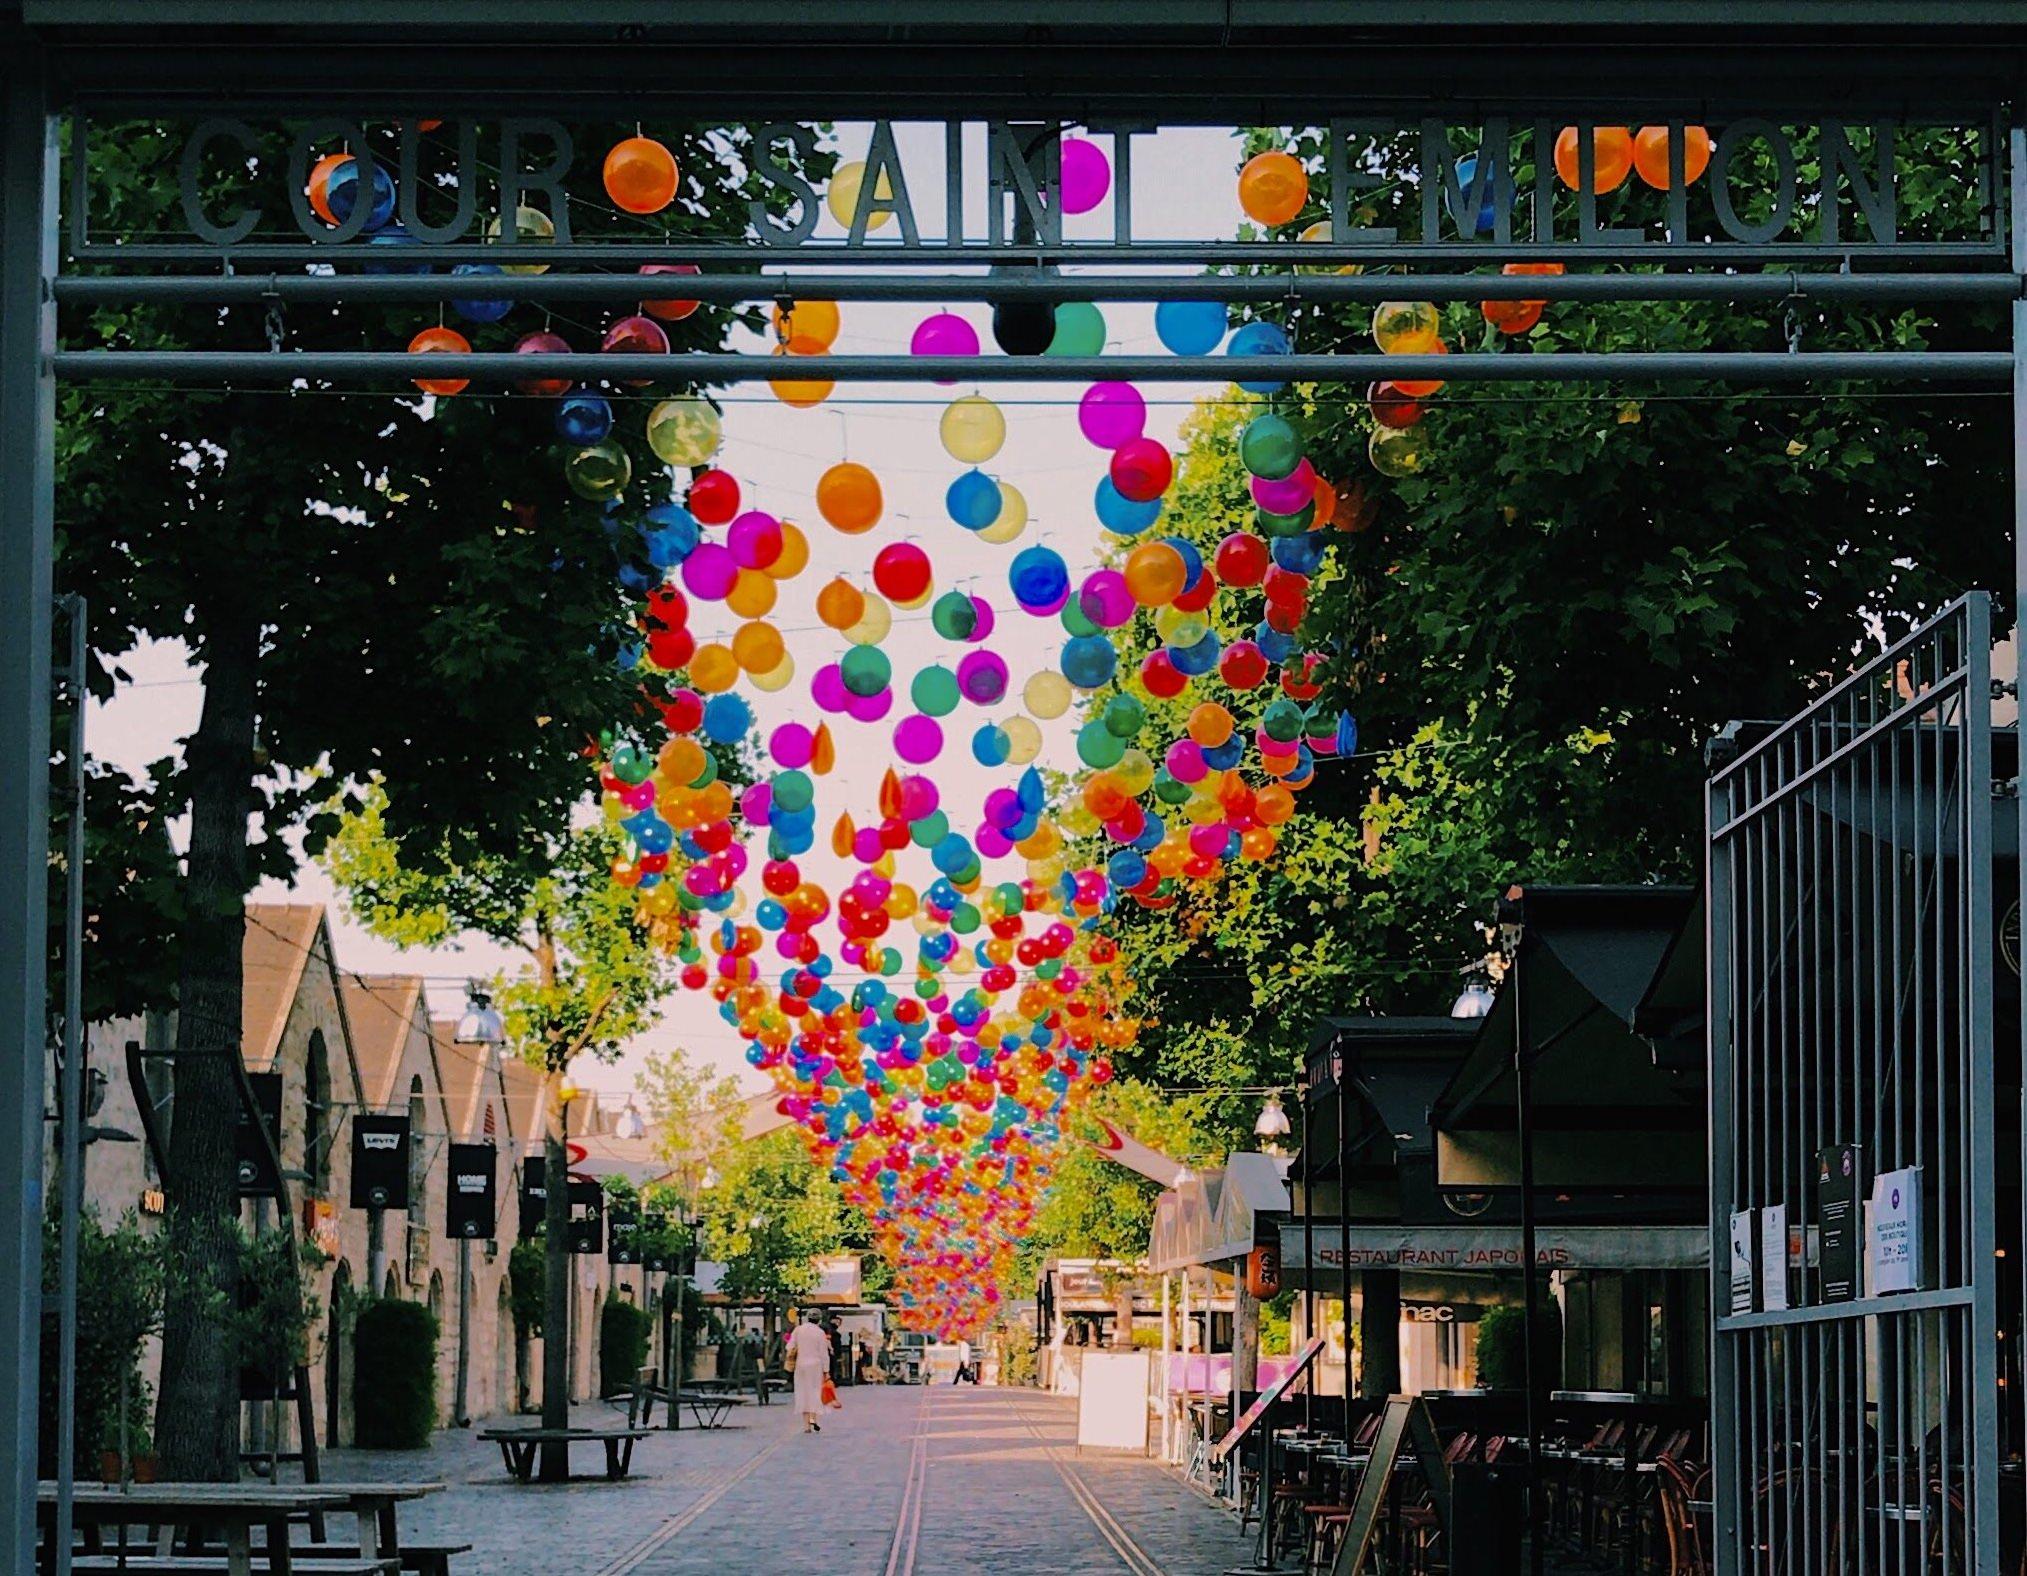 Bercy Village recouverts de ballons multicolores